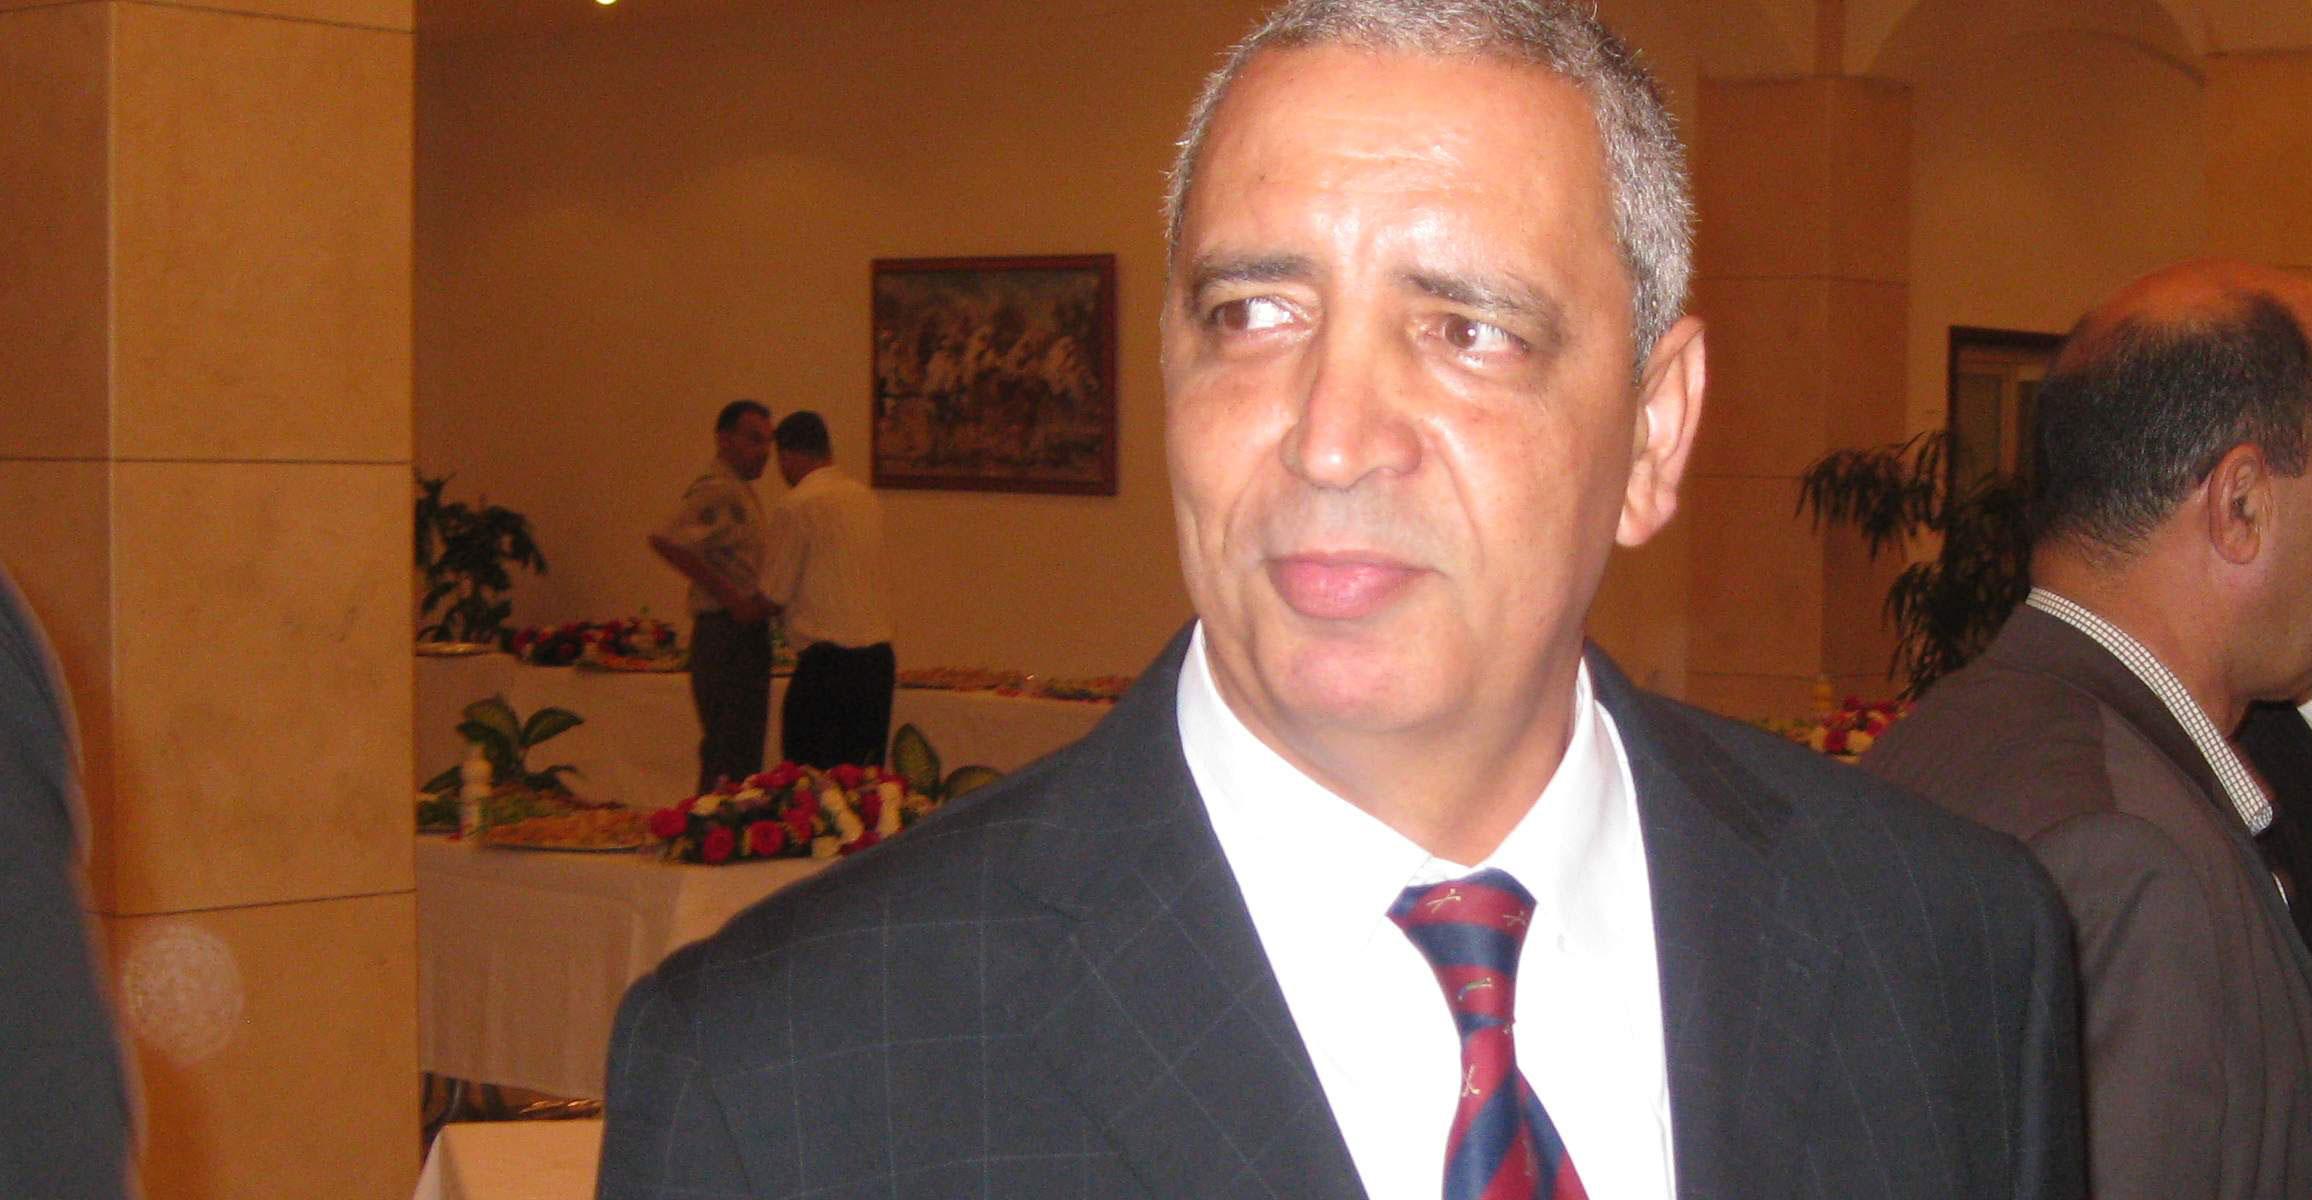 el-mourrro-president-de-lasmo-1428706433.jpg